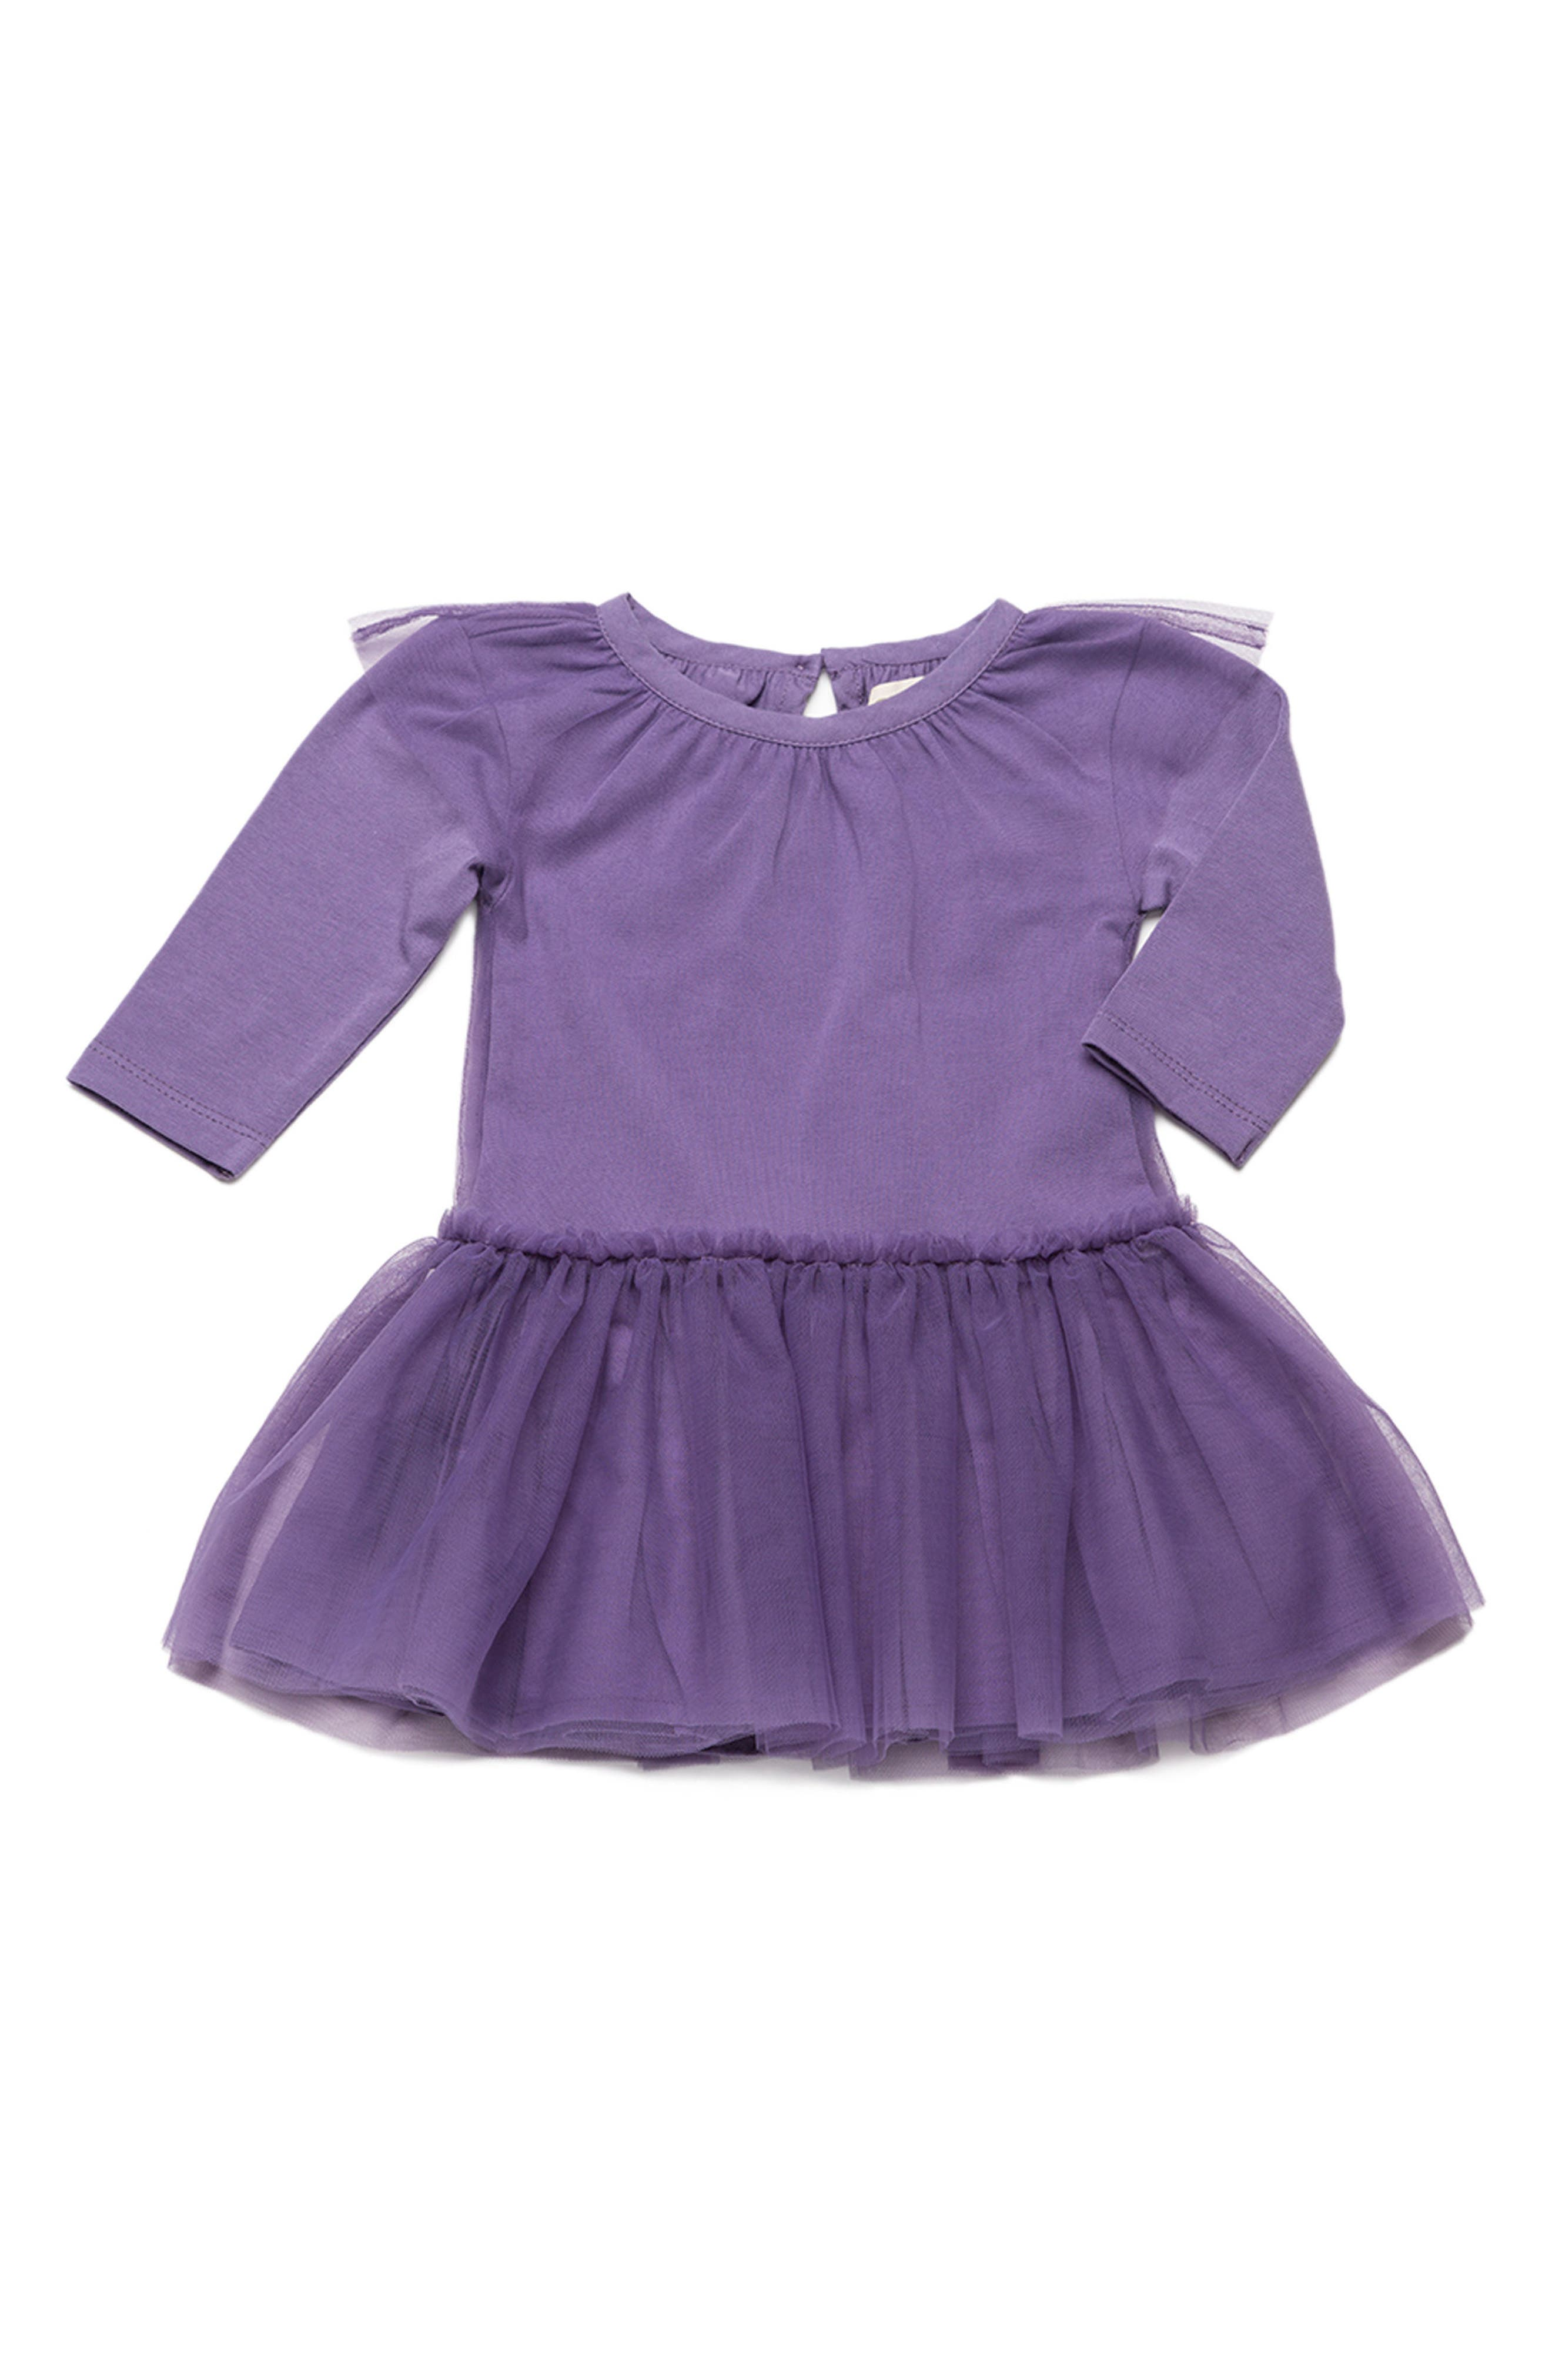 Little Belle Tulle Dress,                         Main,                         color, 500